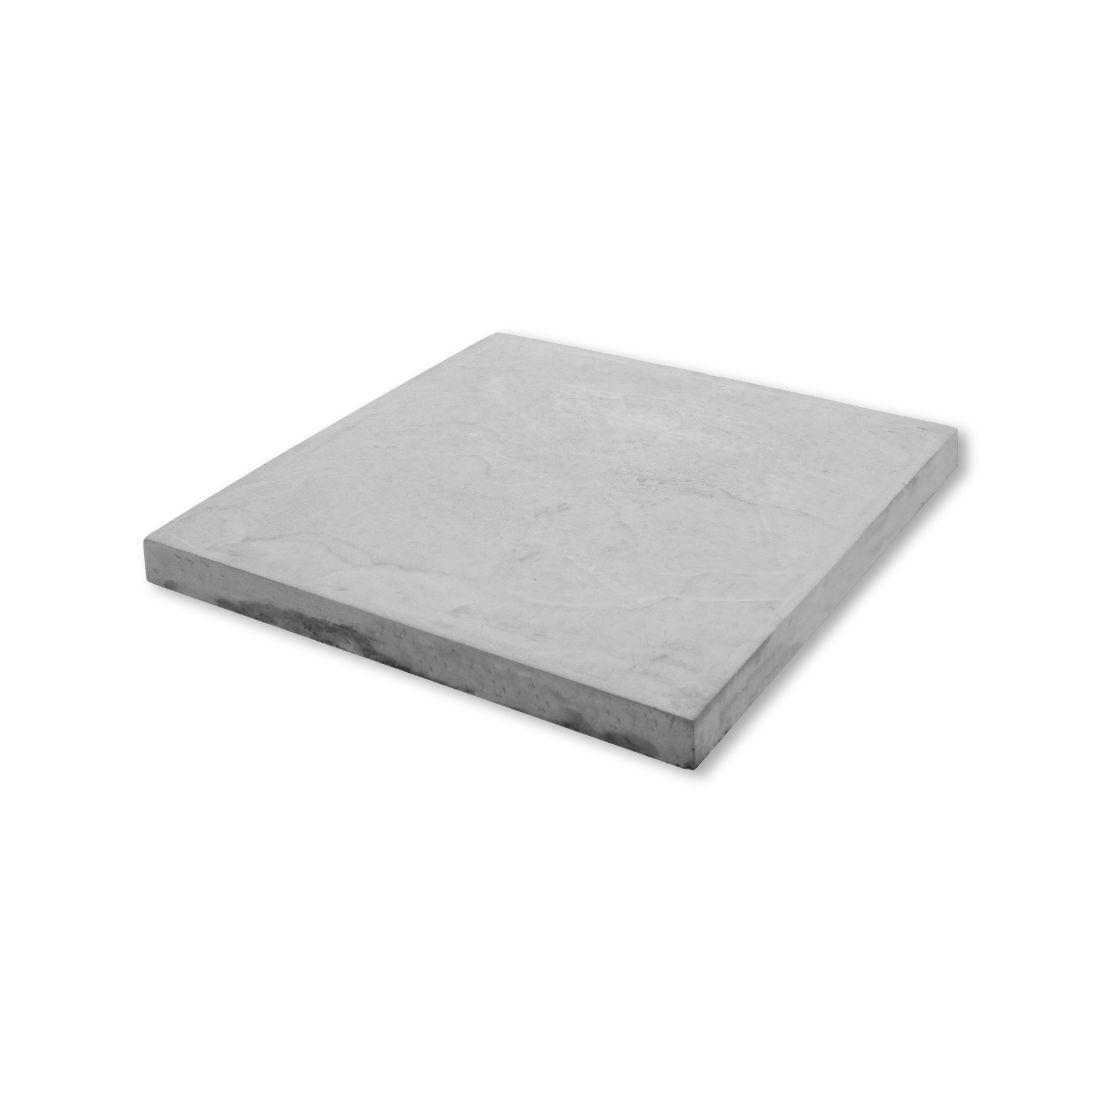 Romani Concrete Paver 600 x 600 x 37mm Natural Stone